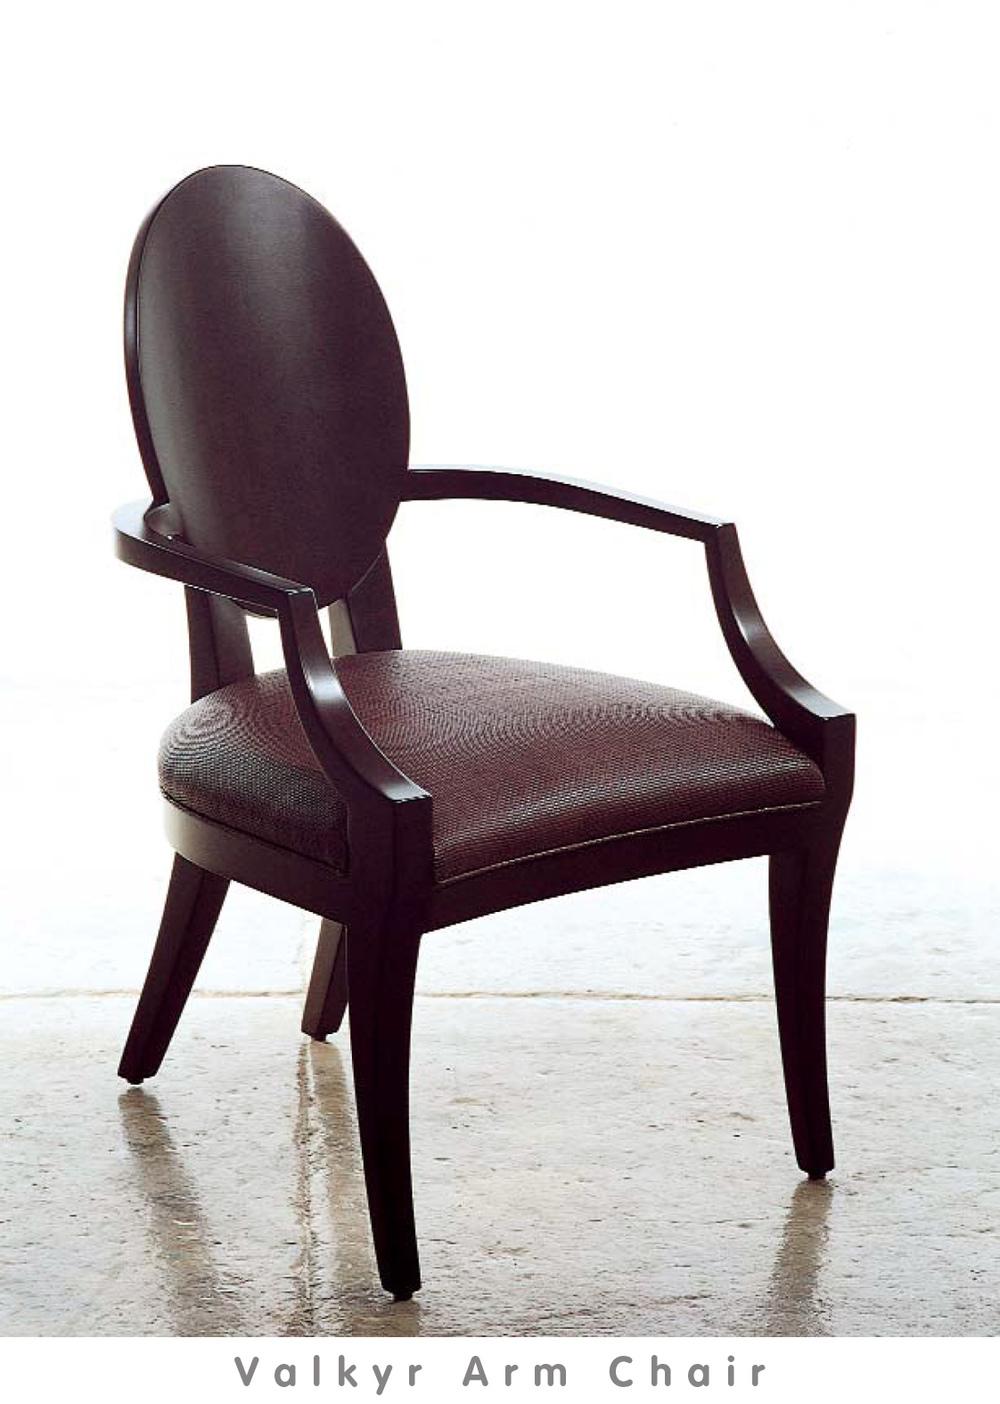 Valkyr Arm Chair